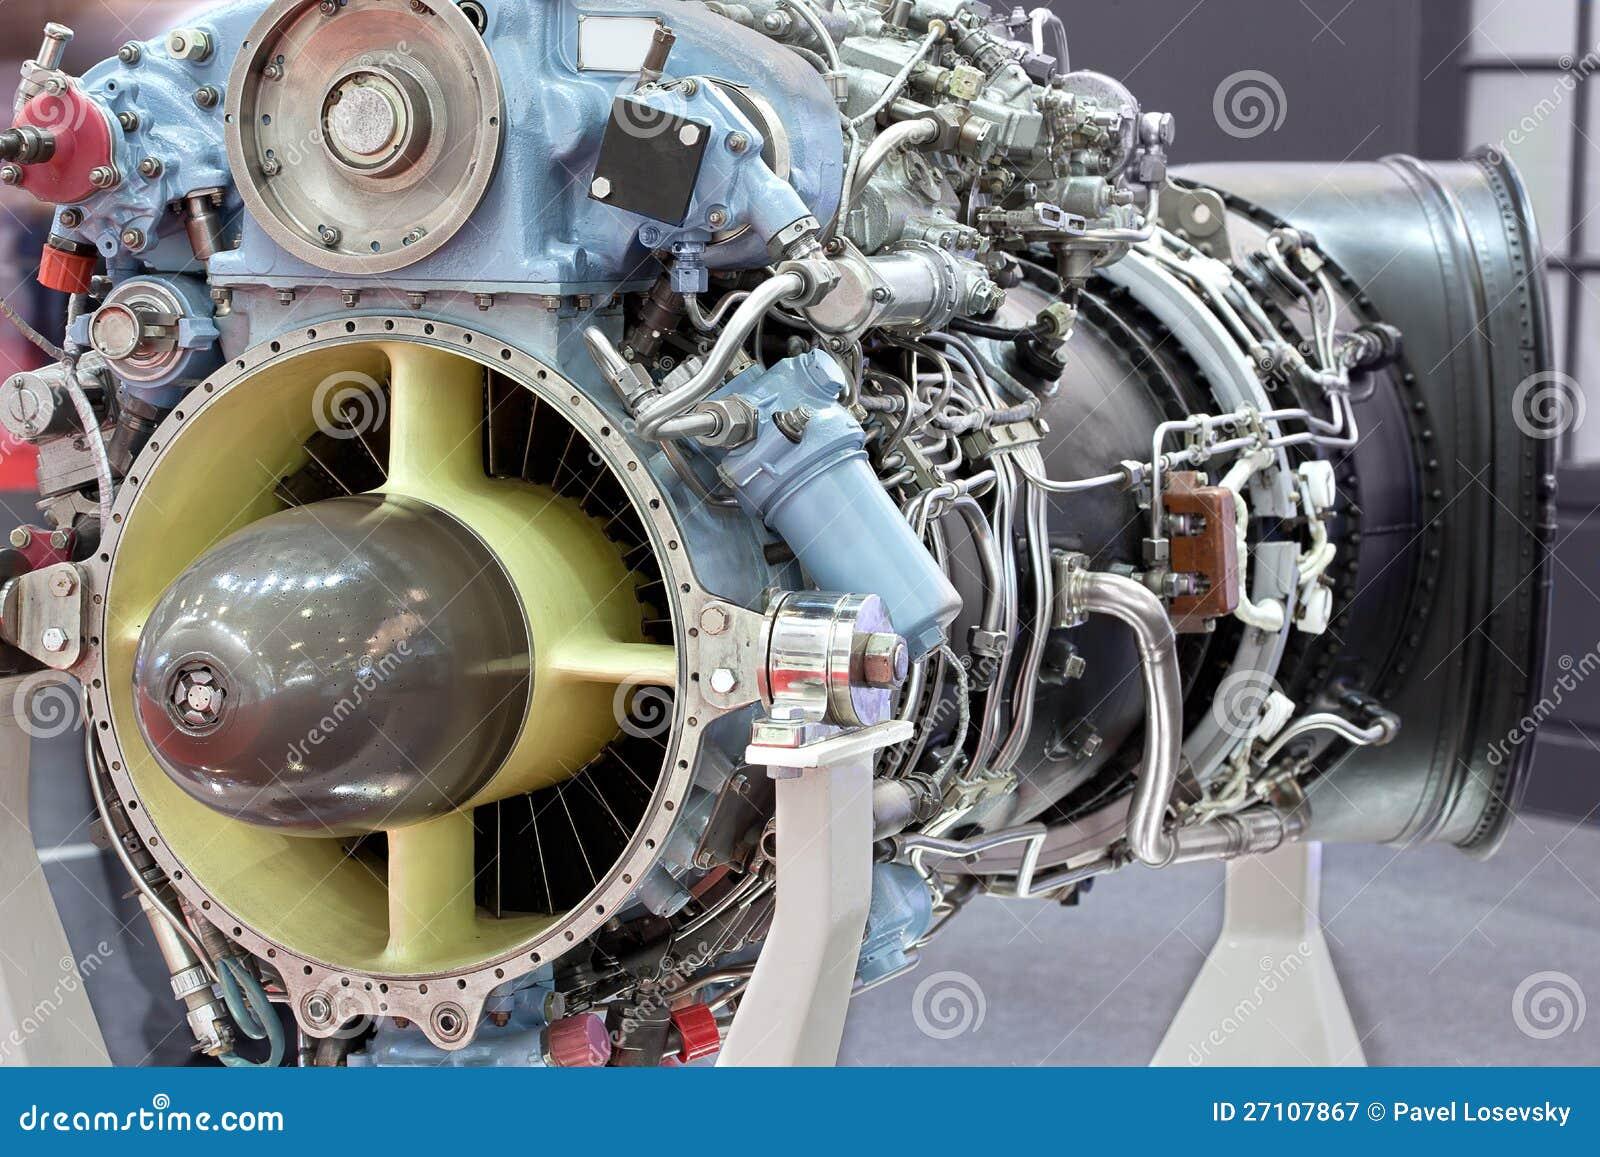 turbine rotorcraft